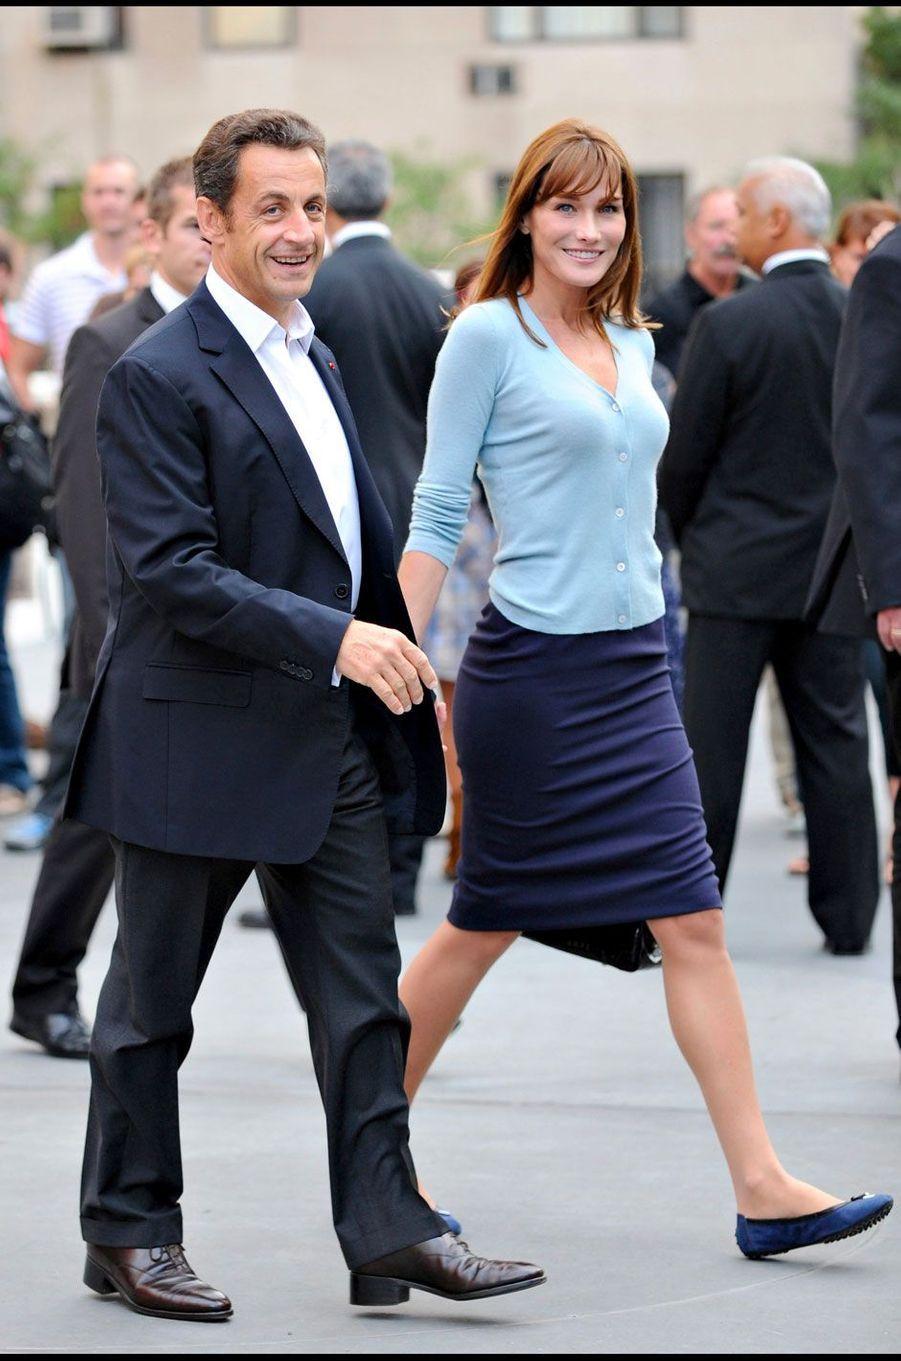 Nicolas Sarkozy et Carla Bruni à New York le 22 septembre 2008